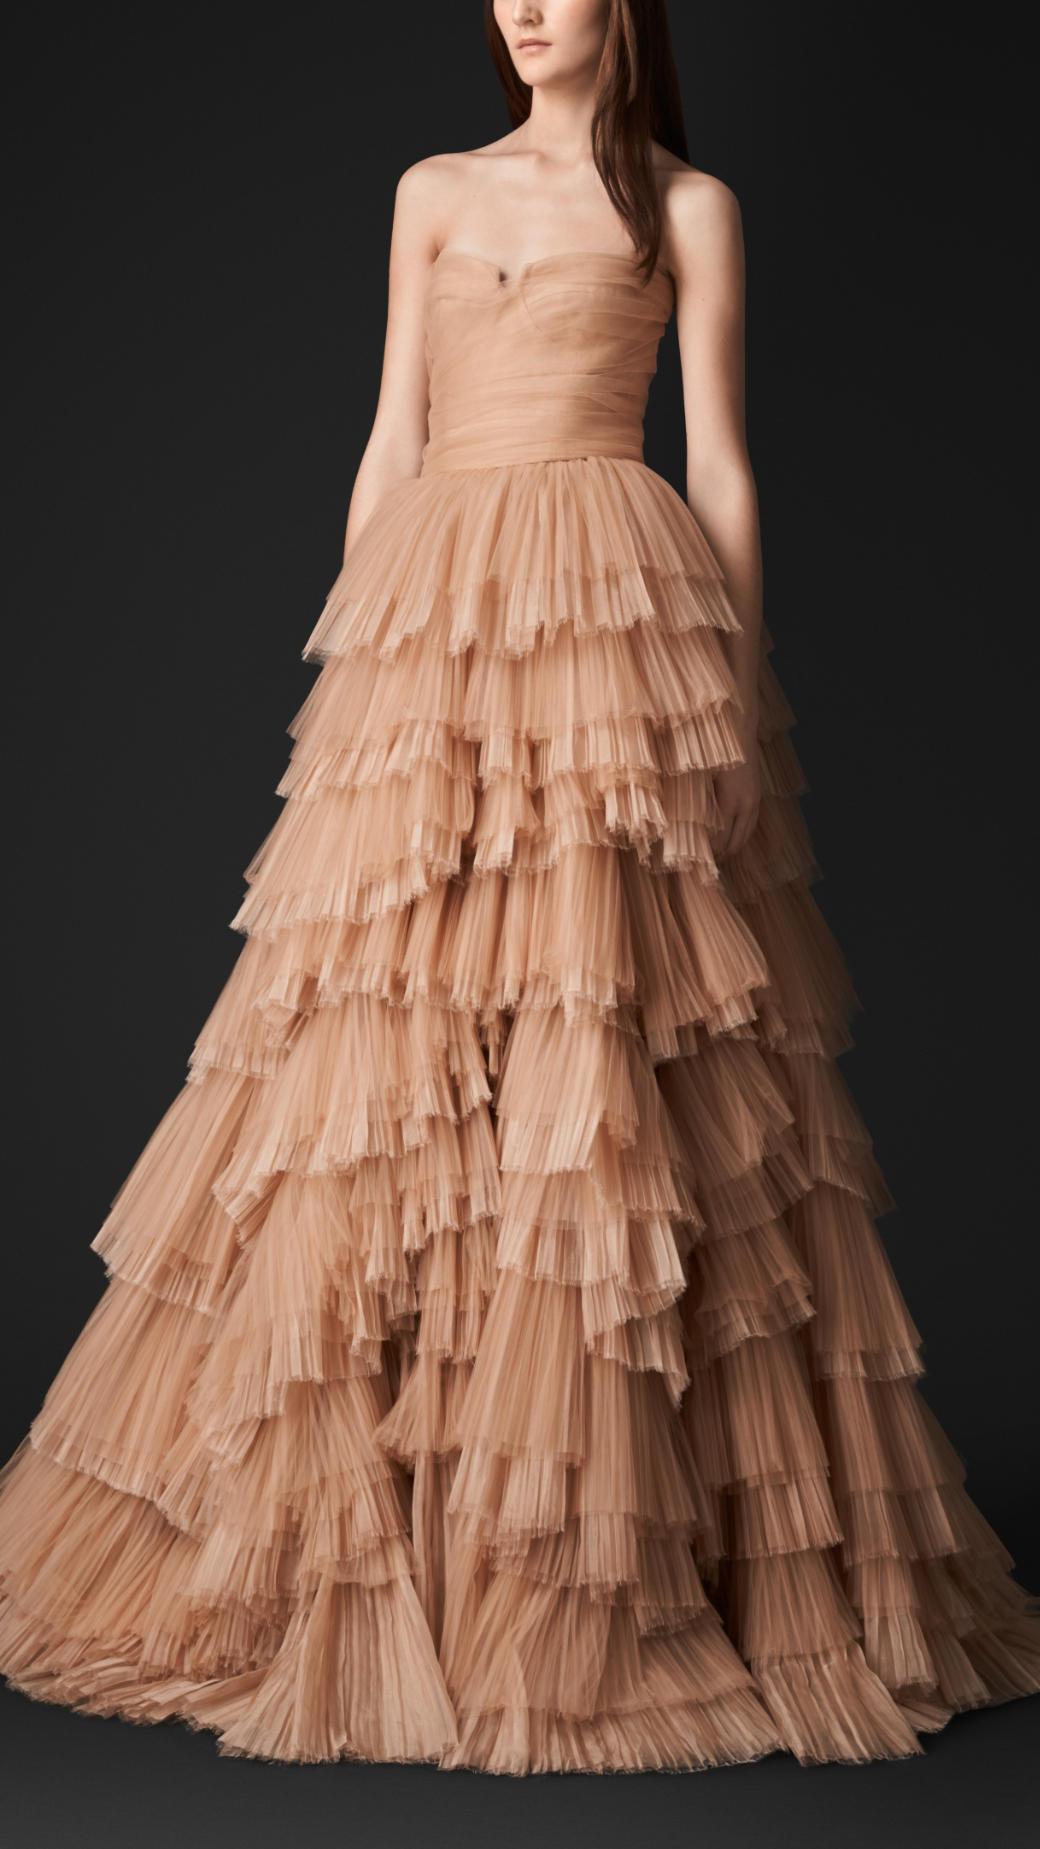 Silk organza evening dresses